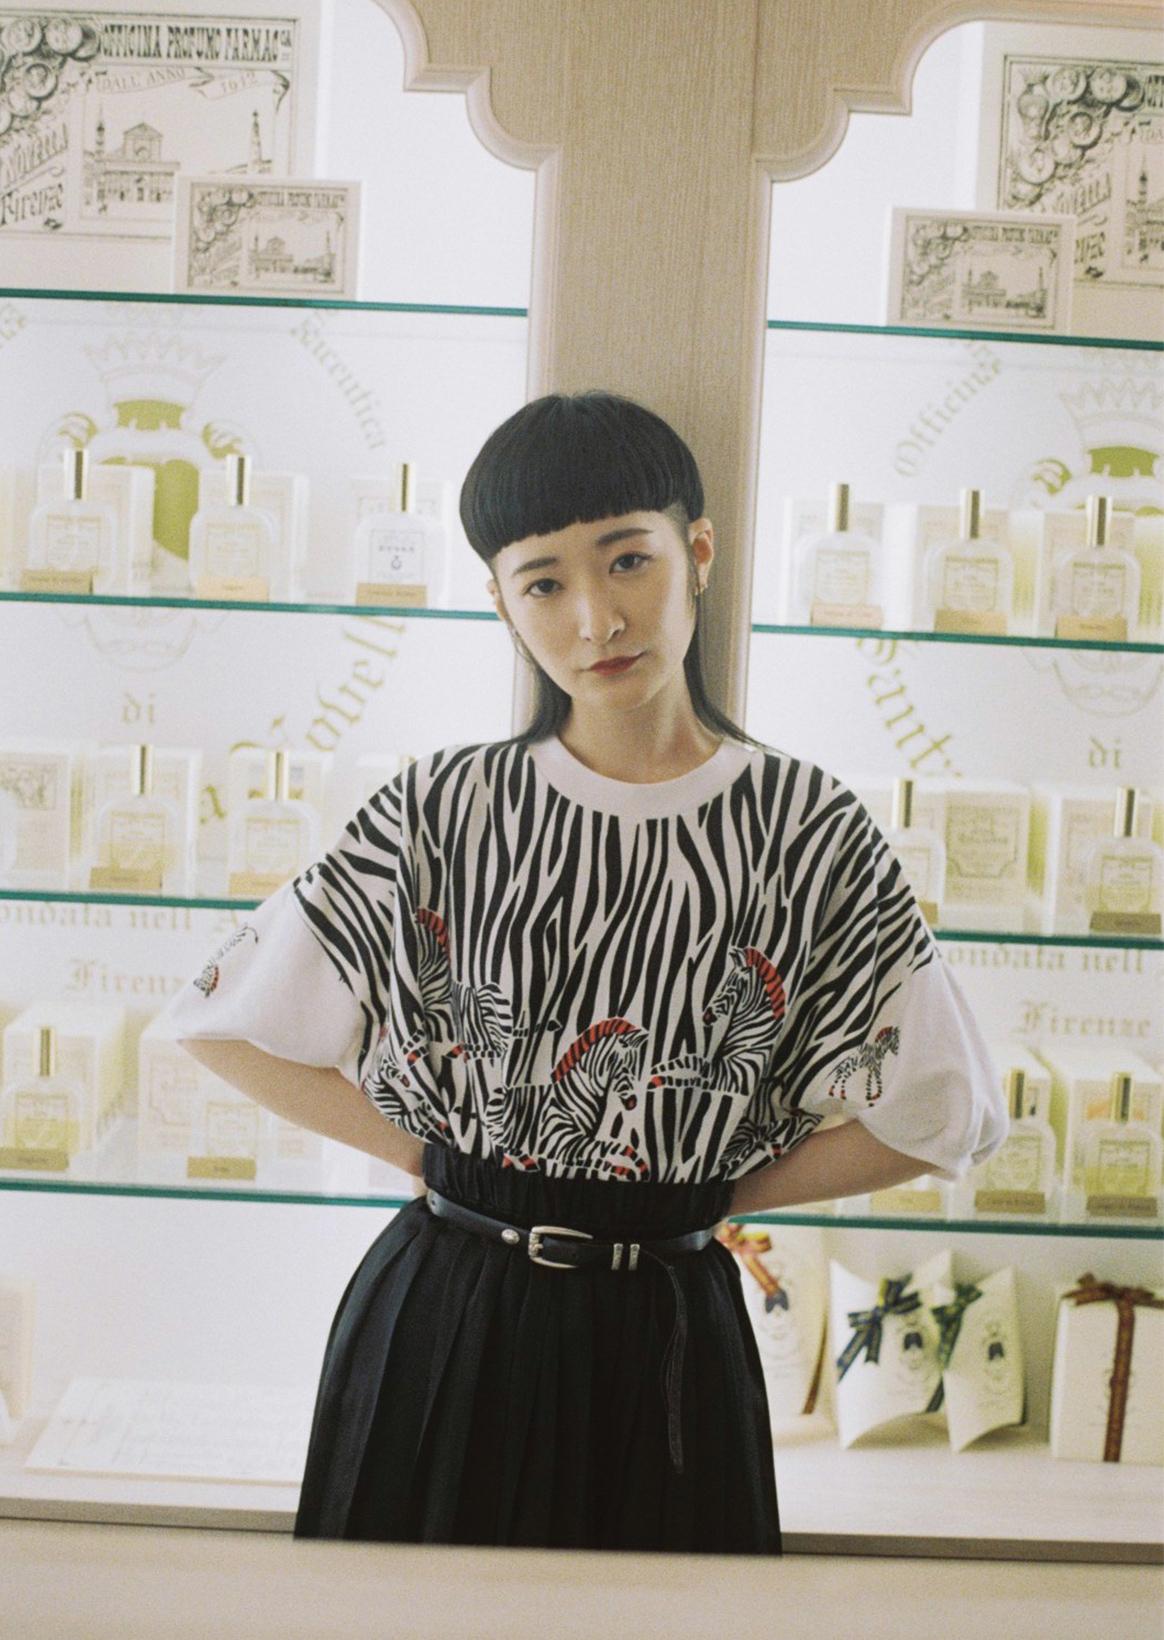 玲玲(BiSH)×Santa Maria Novella/Yves Saint Laurent Beauté|刺激五感,研磨美感的遊覽勝地訪問